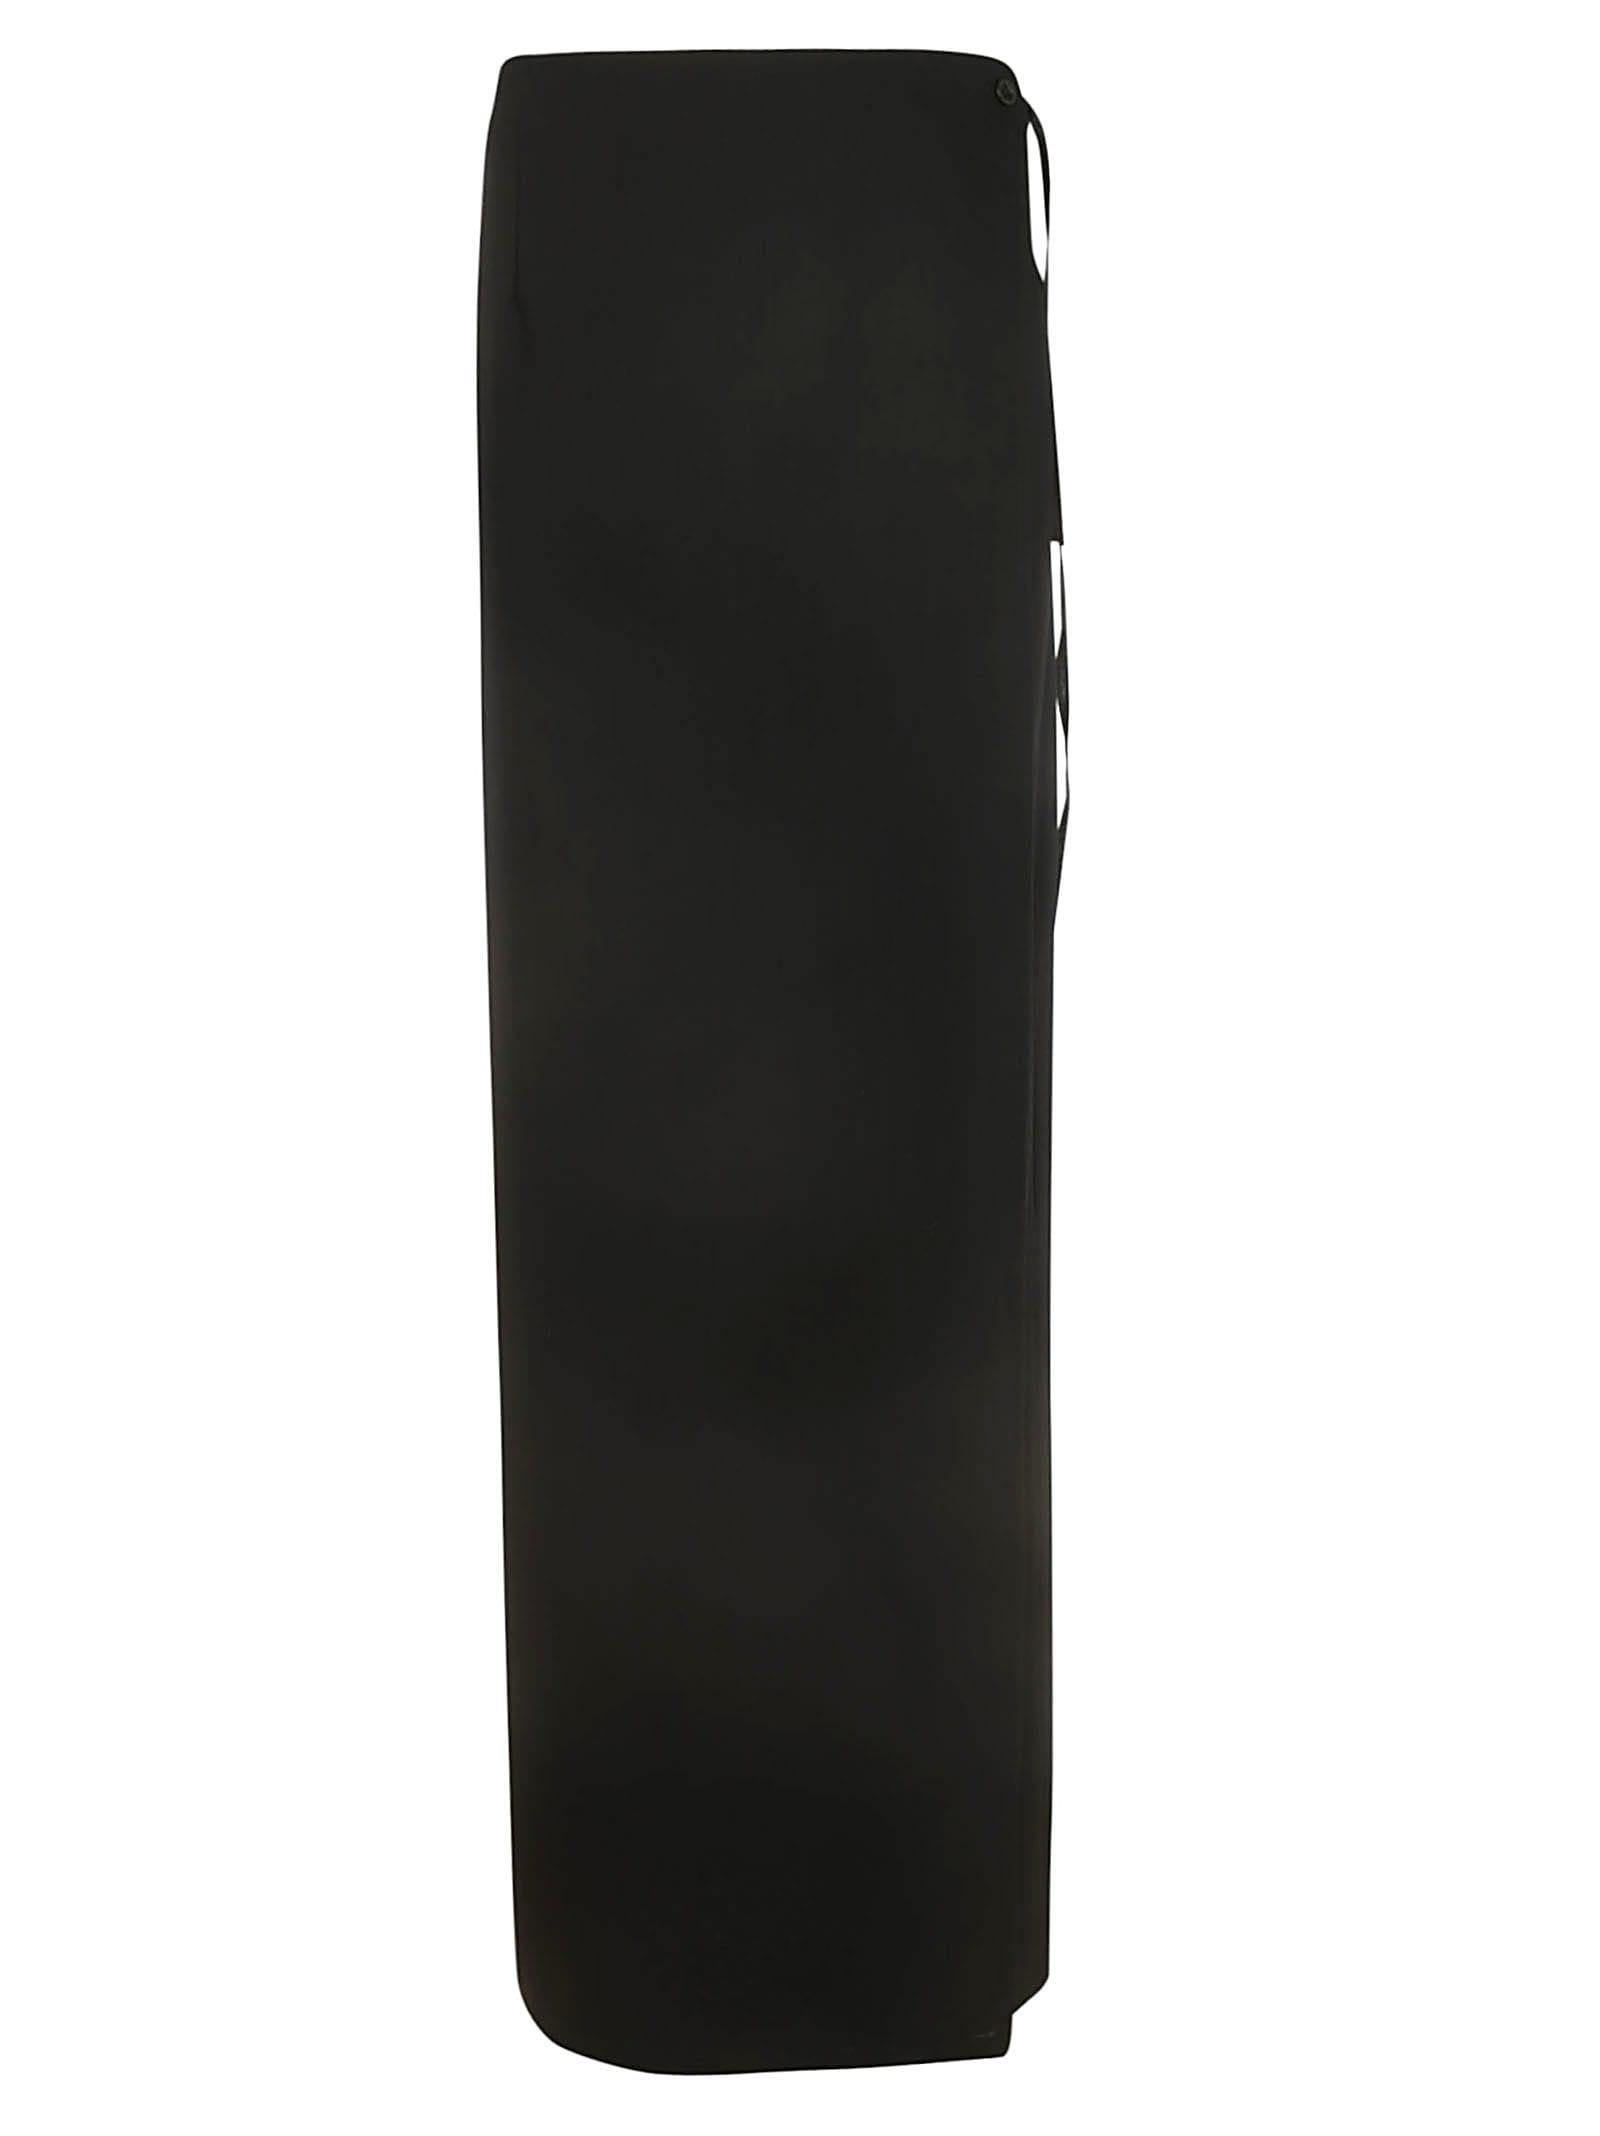 Ann Demeulemeester Side Tie Skirt